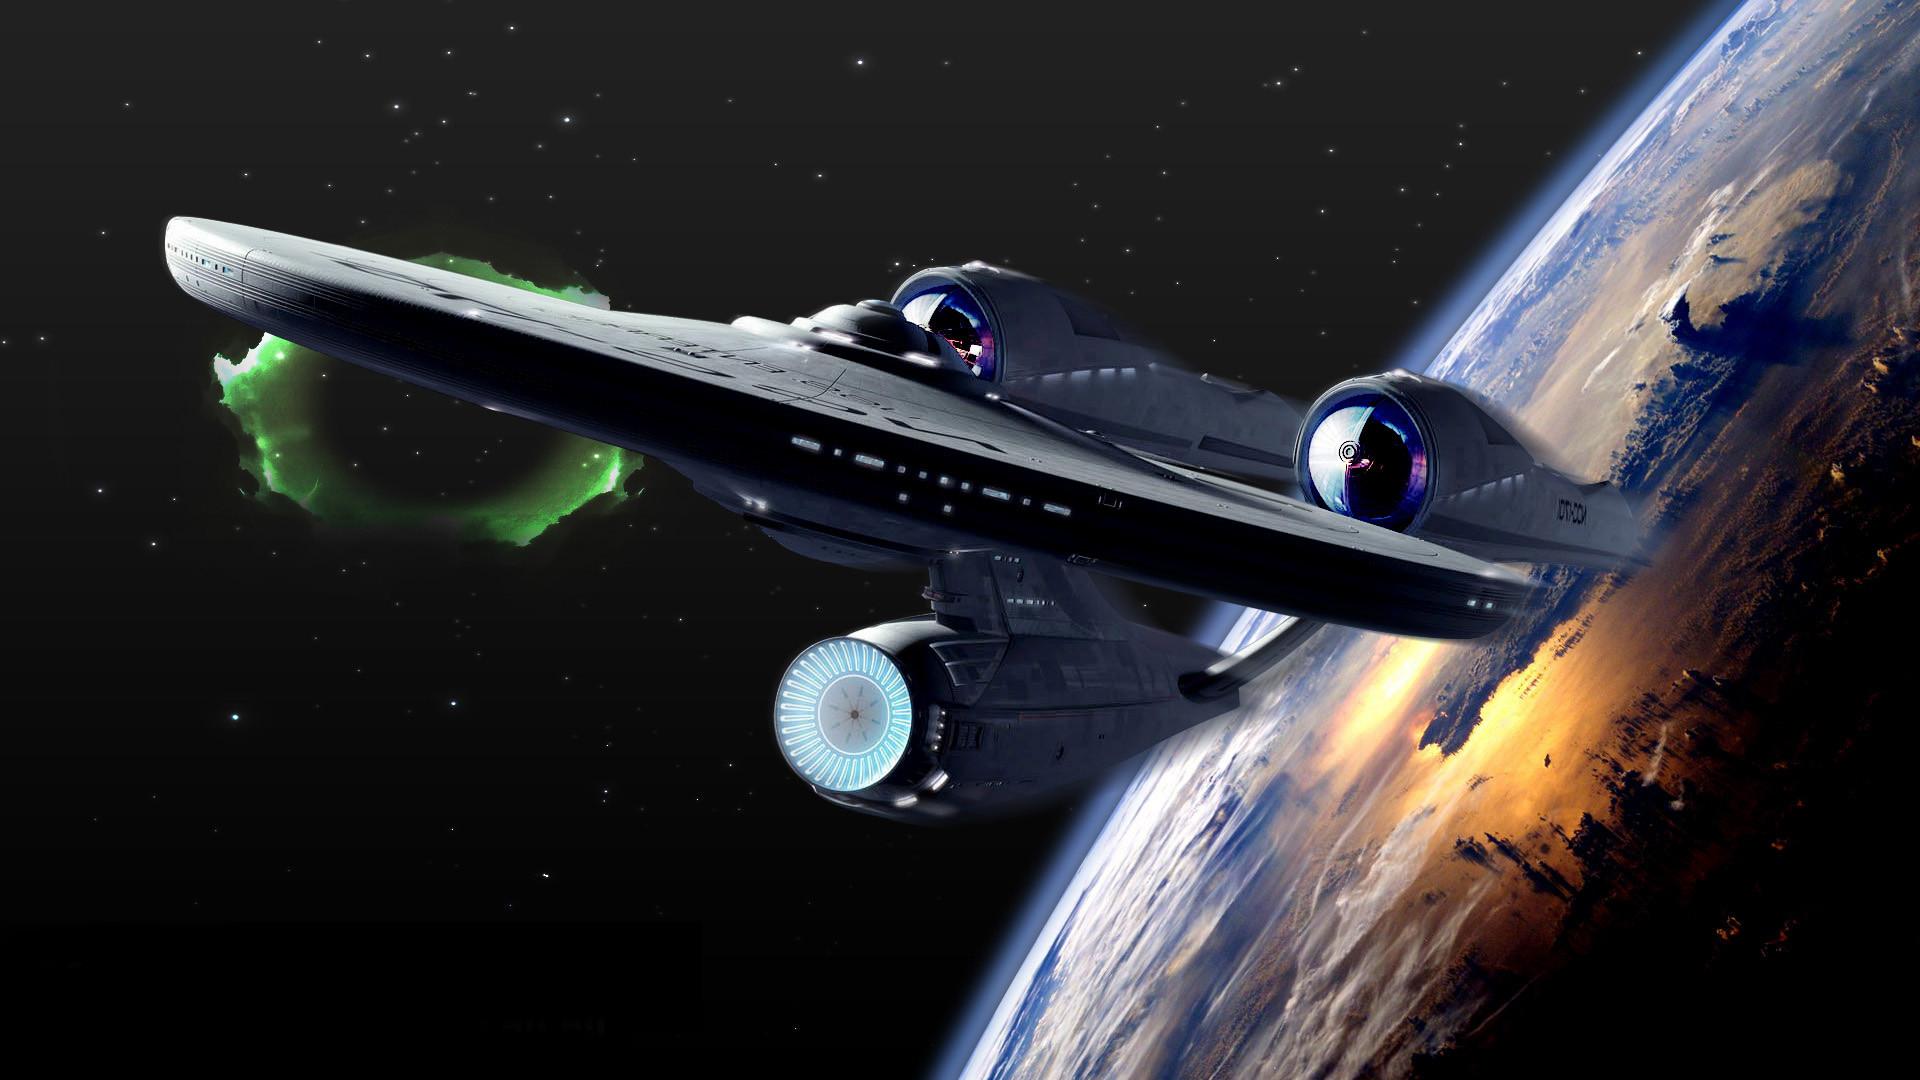 Star Trek SHip HD Wallpapers